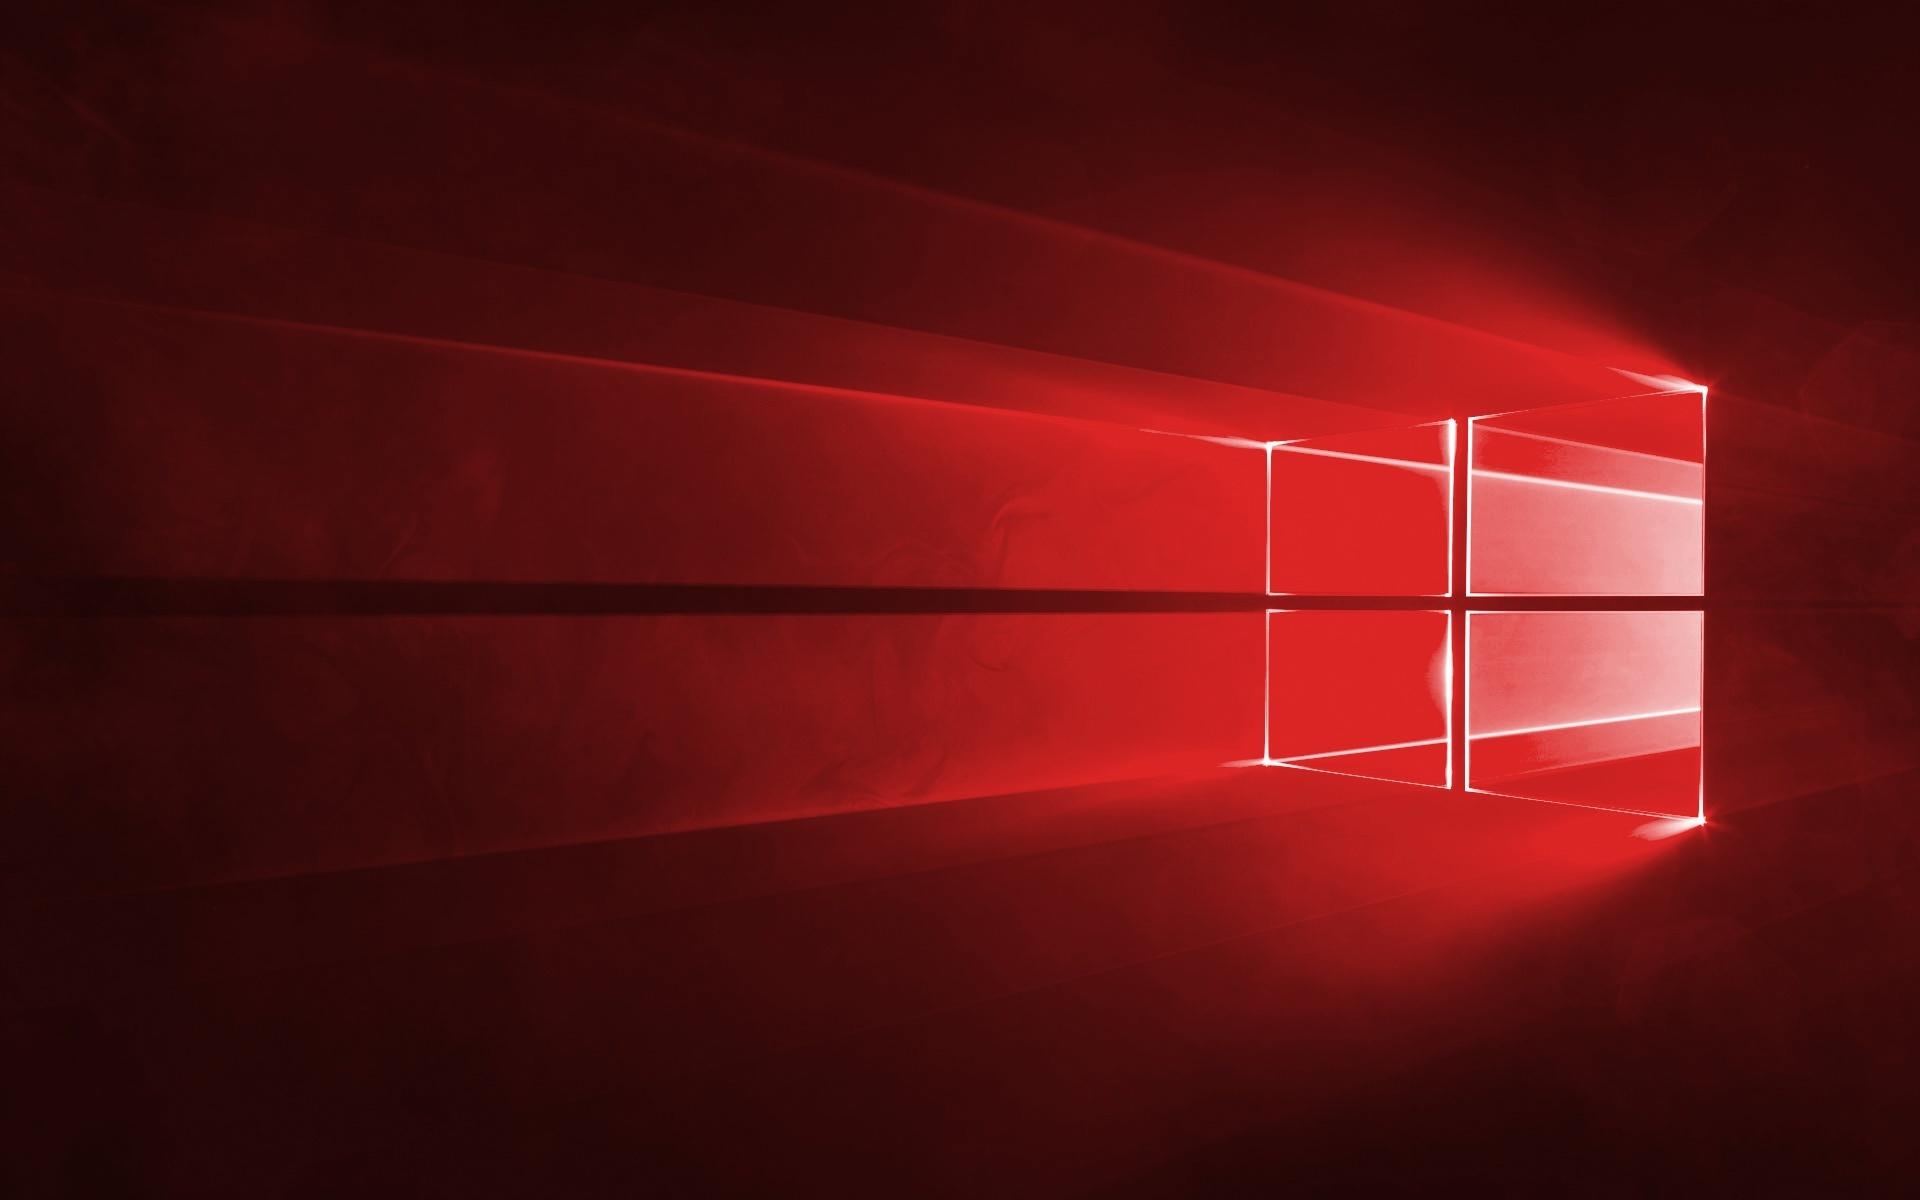 Red Windows 10 wallpaper 37885 1920x1200